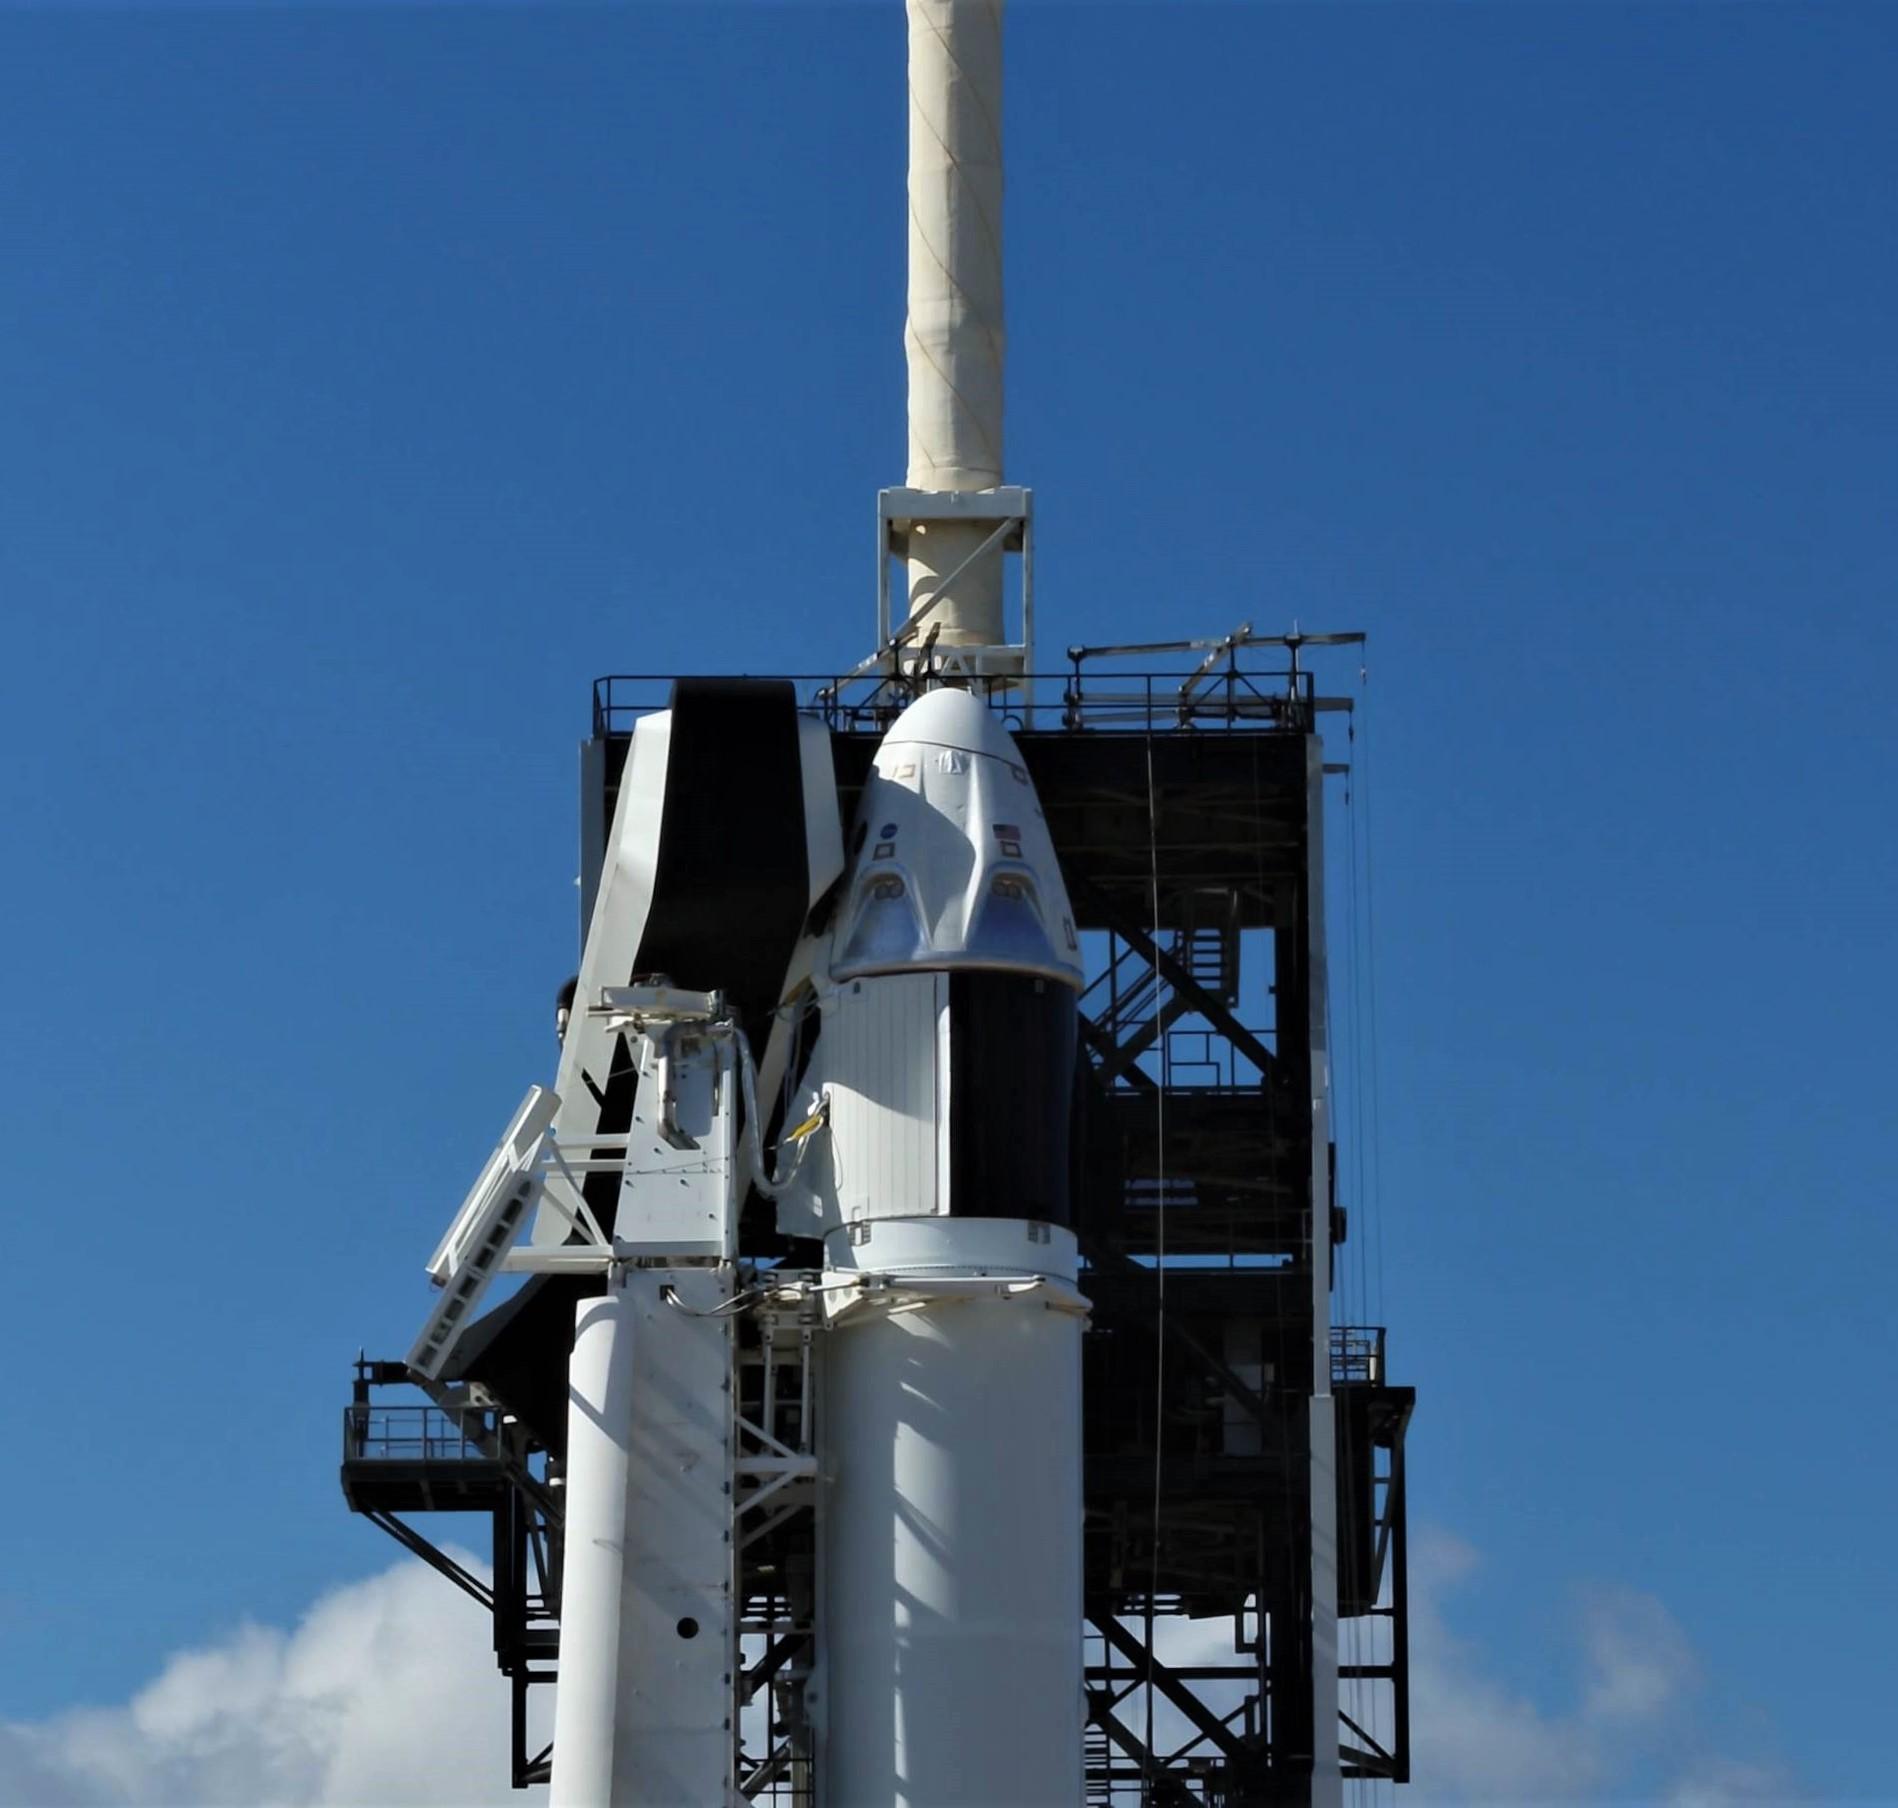 Crew Dragon Falcon 9 DM-1 vertical 39A (SpaceX) 12 crop